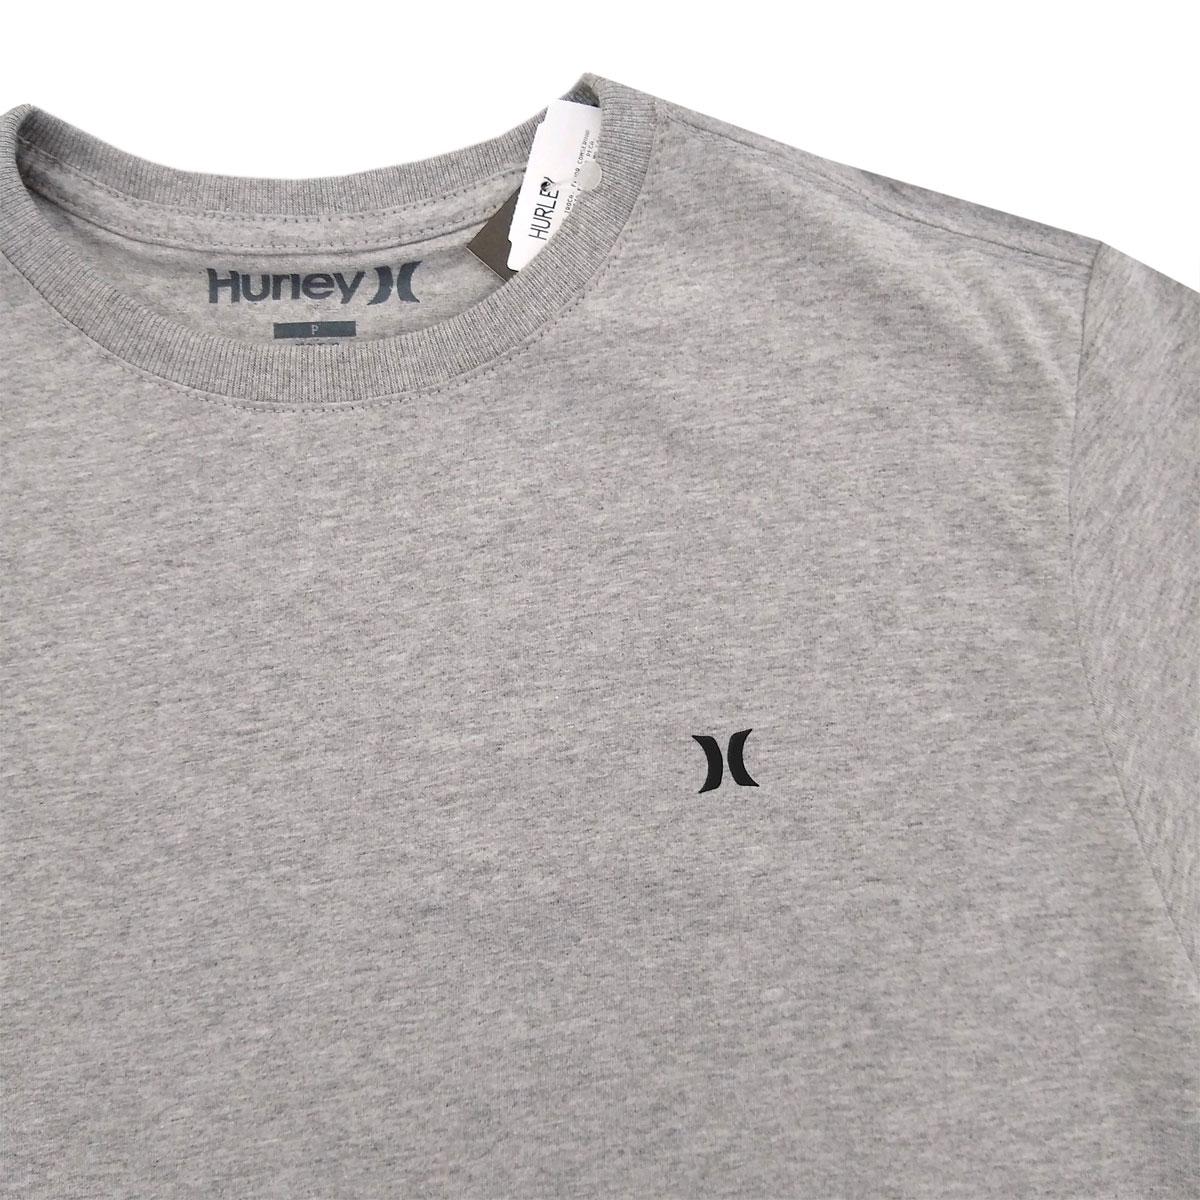 Camiseta Hurley Mini Icon Cinza